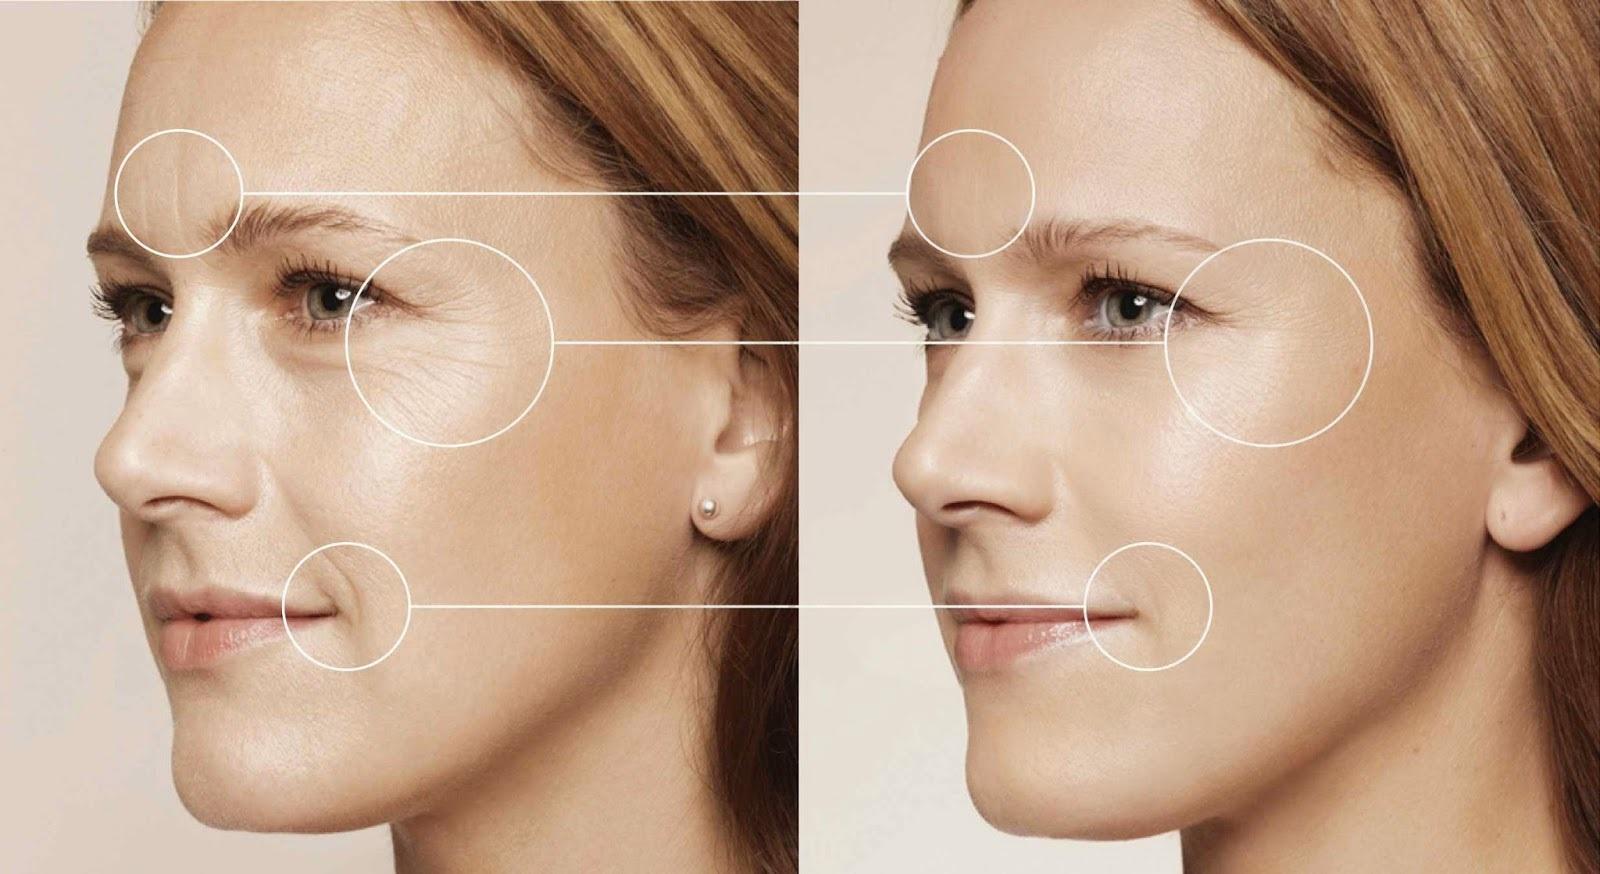 điều trị da bằng spectra laser